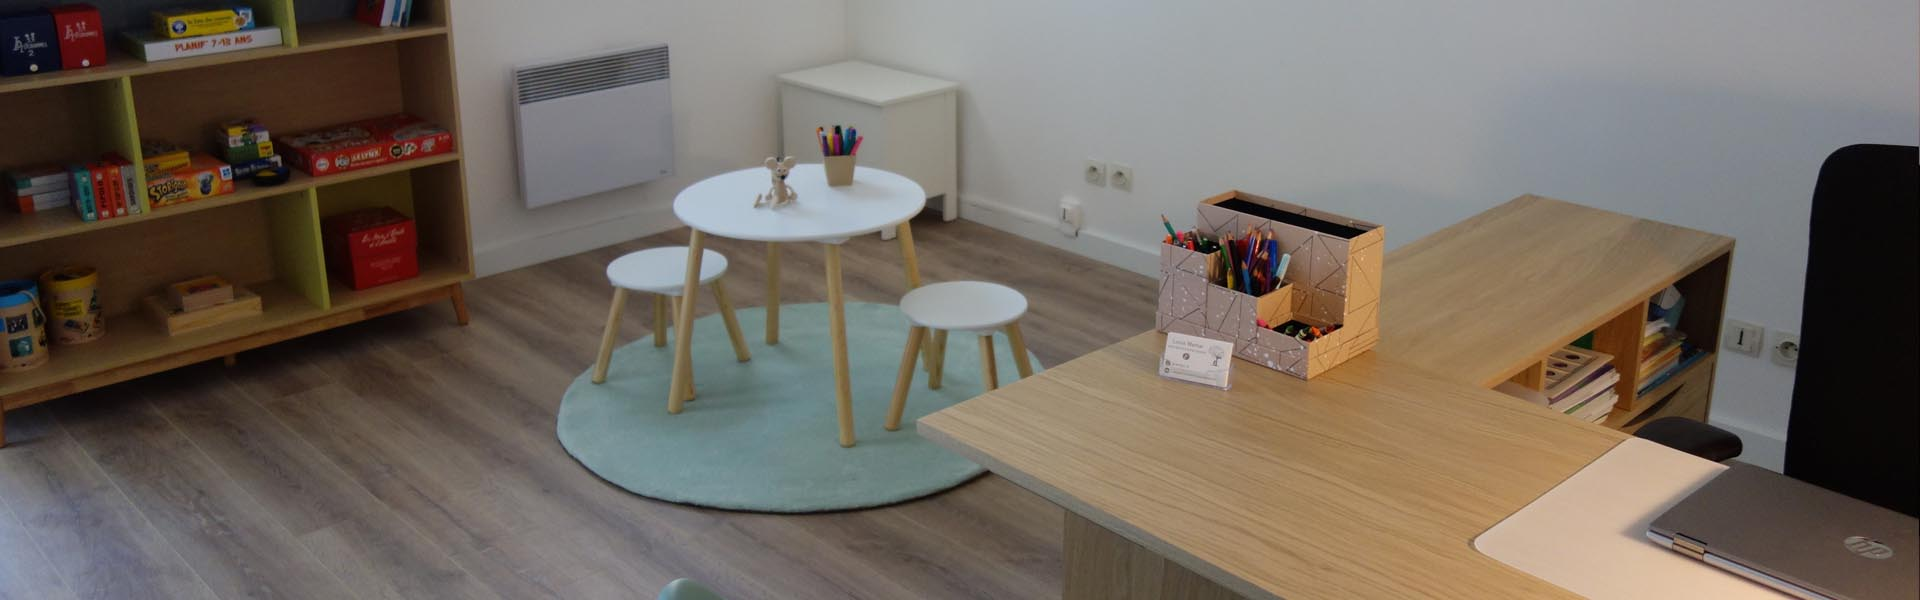 Neuropsychologue Toulouse Cabinet